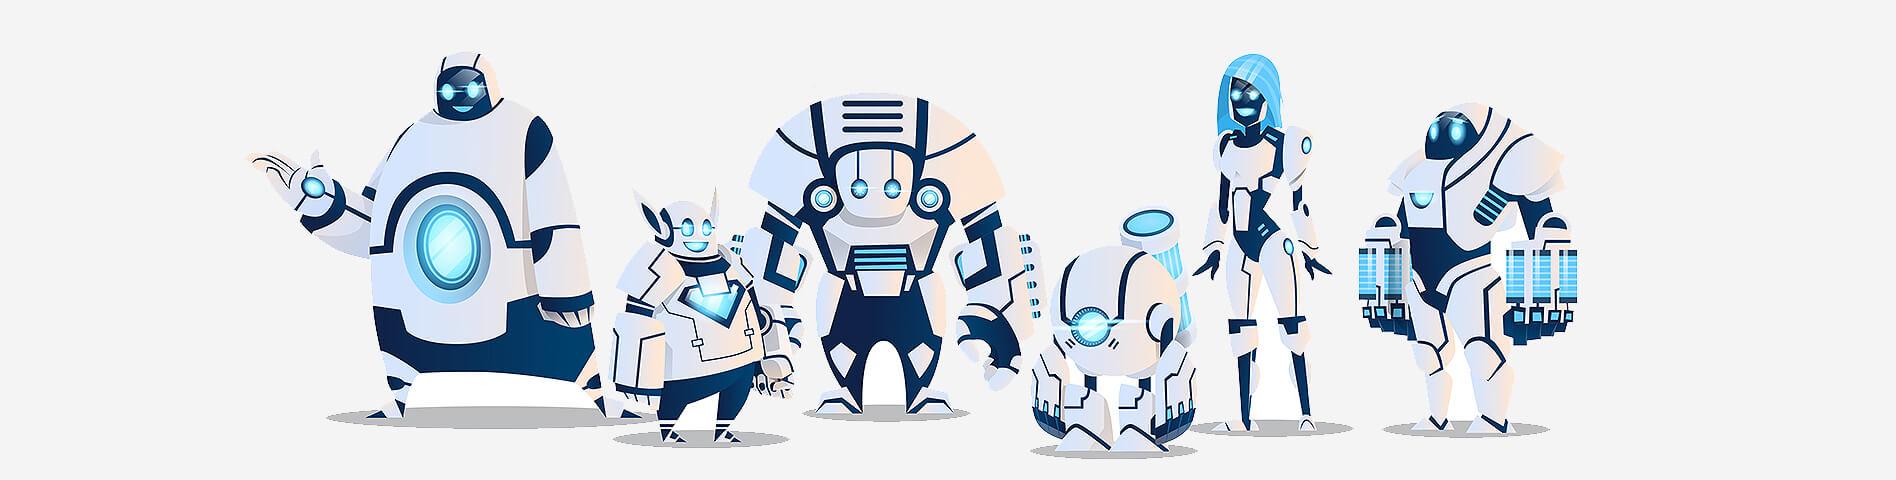 B2B E Business Test Bots